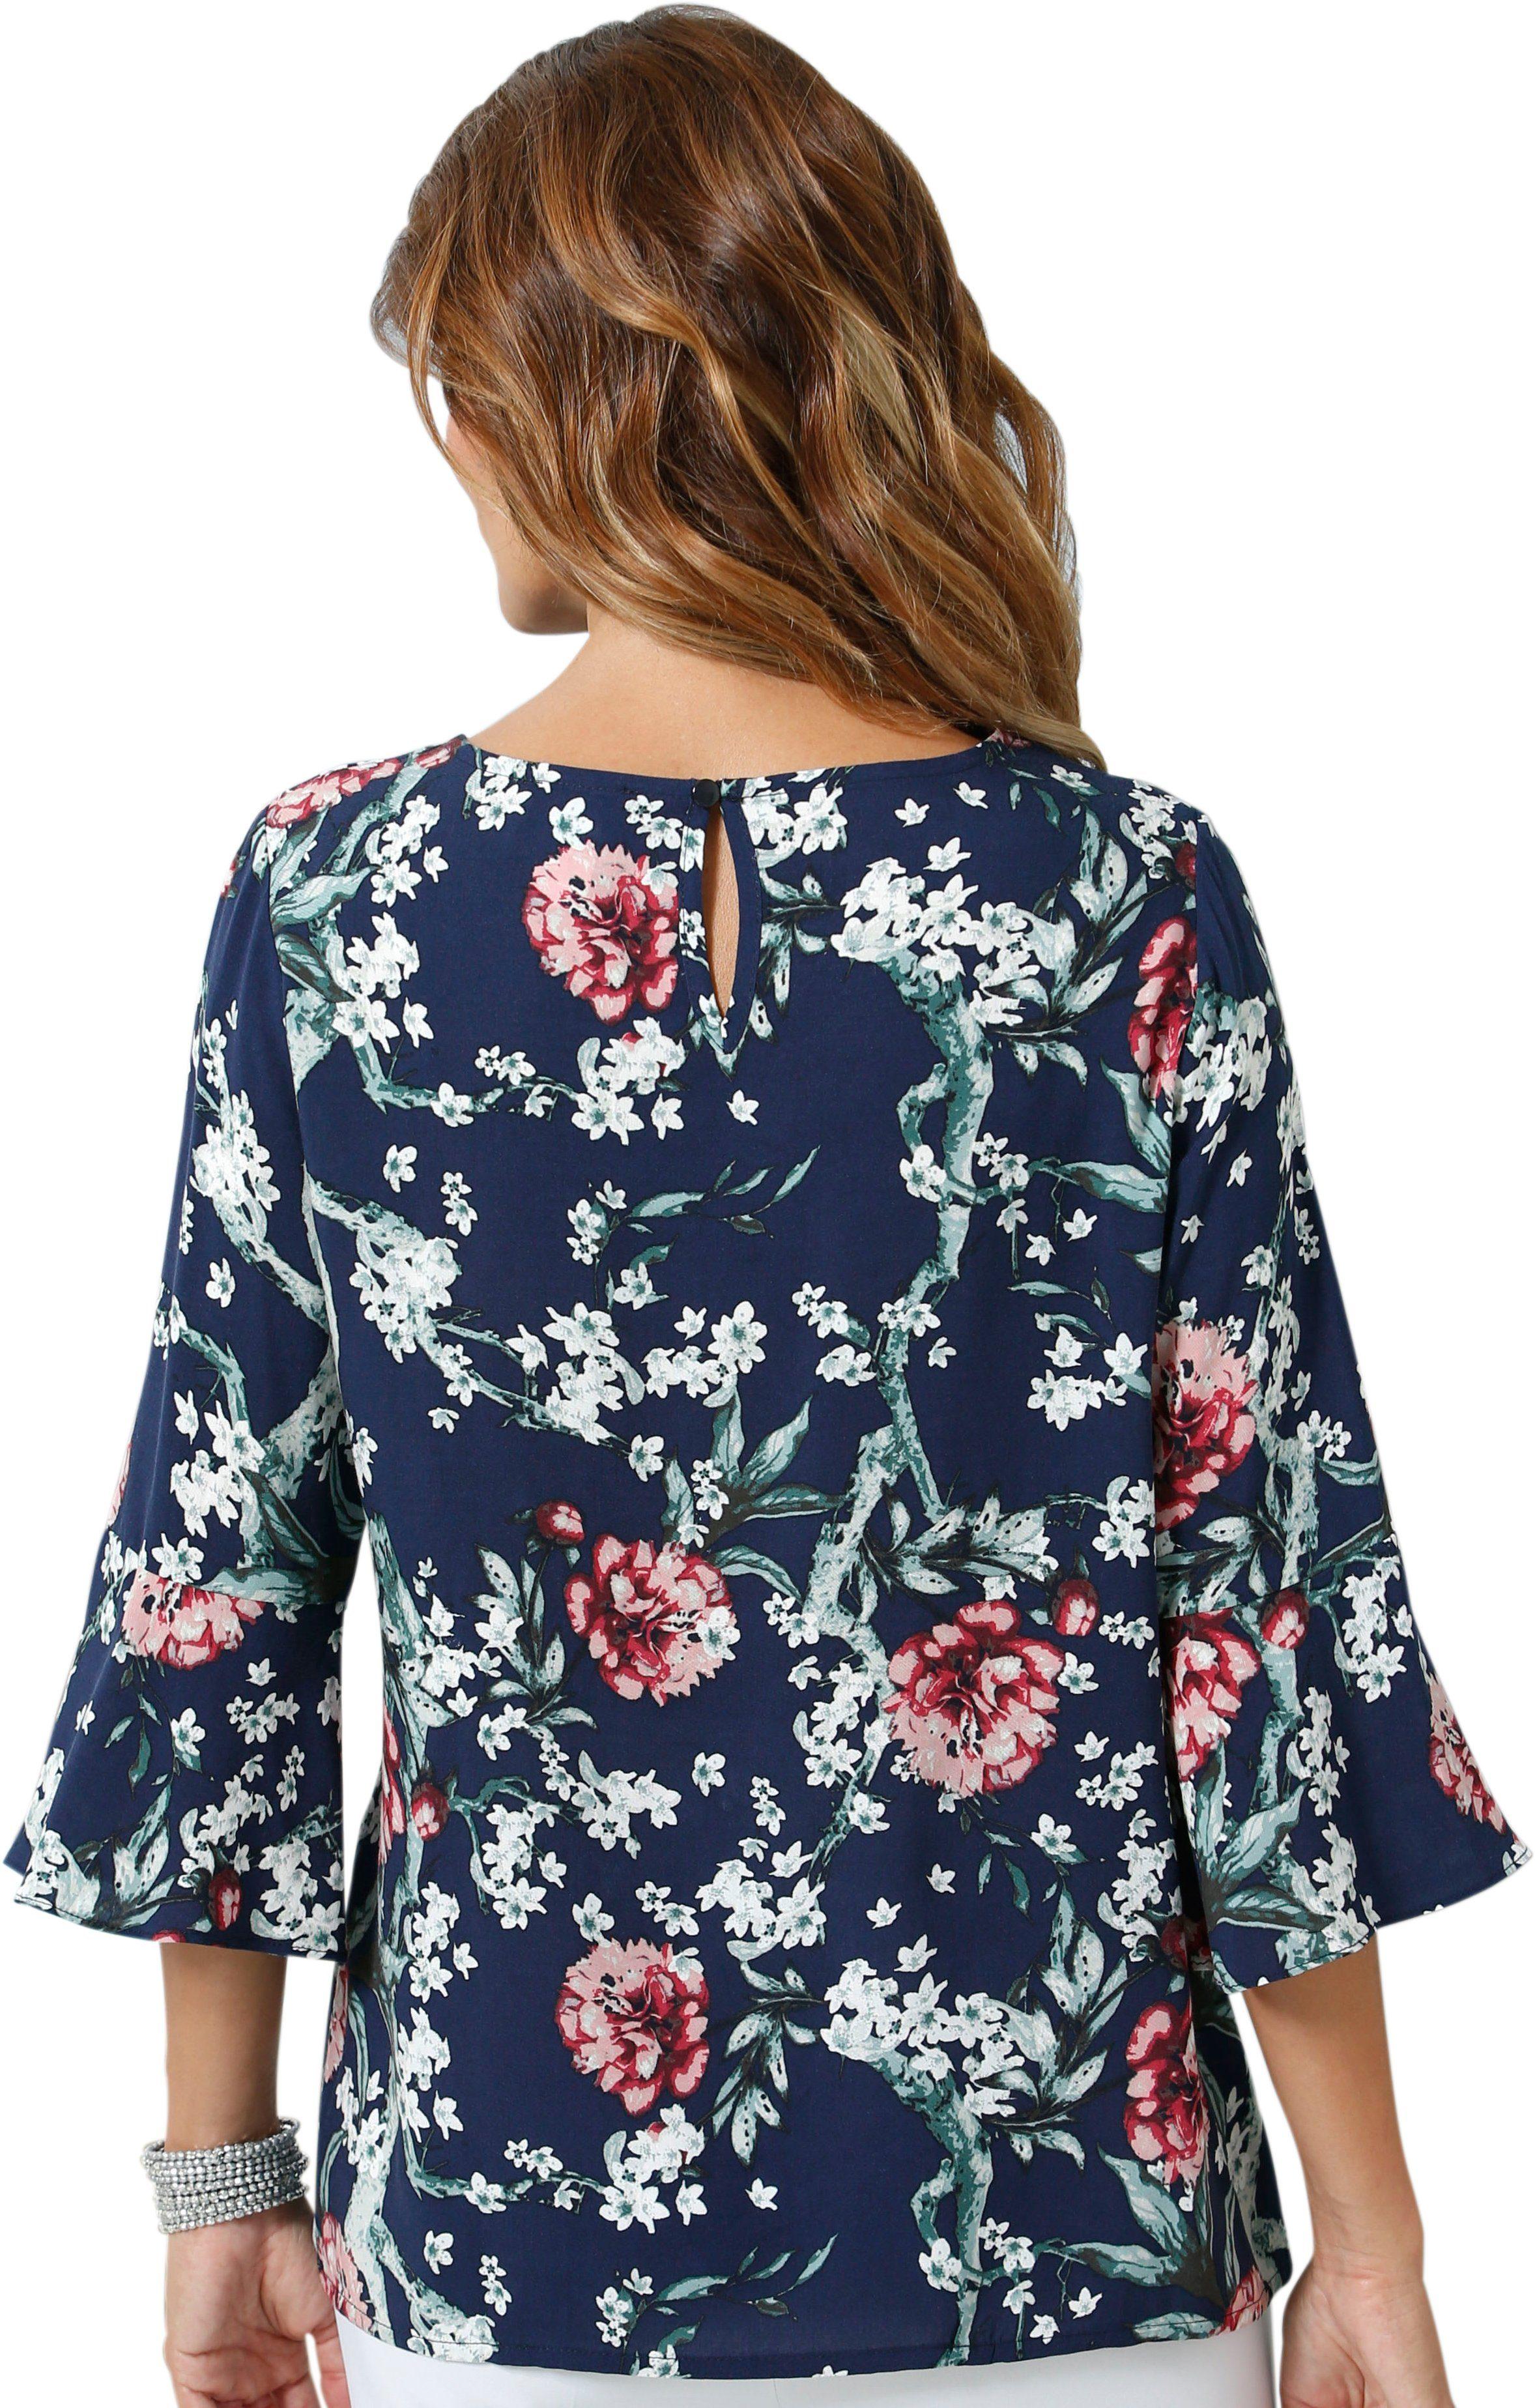 Romantischer Optik Lady Bluse In Kaufen Online iPTXZOuk